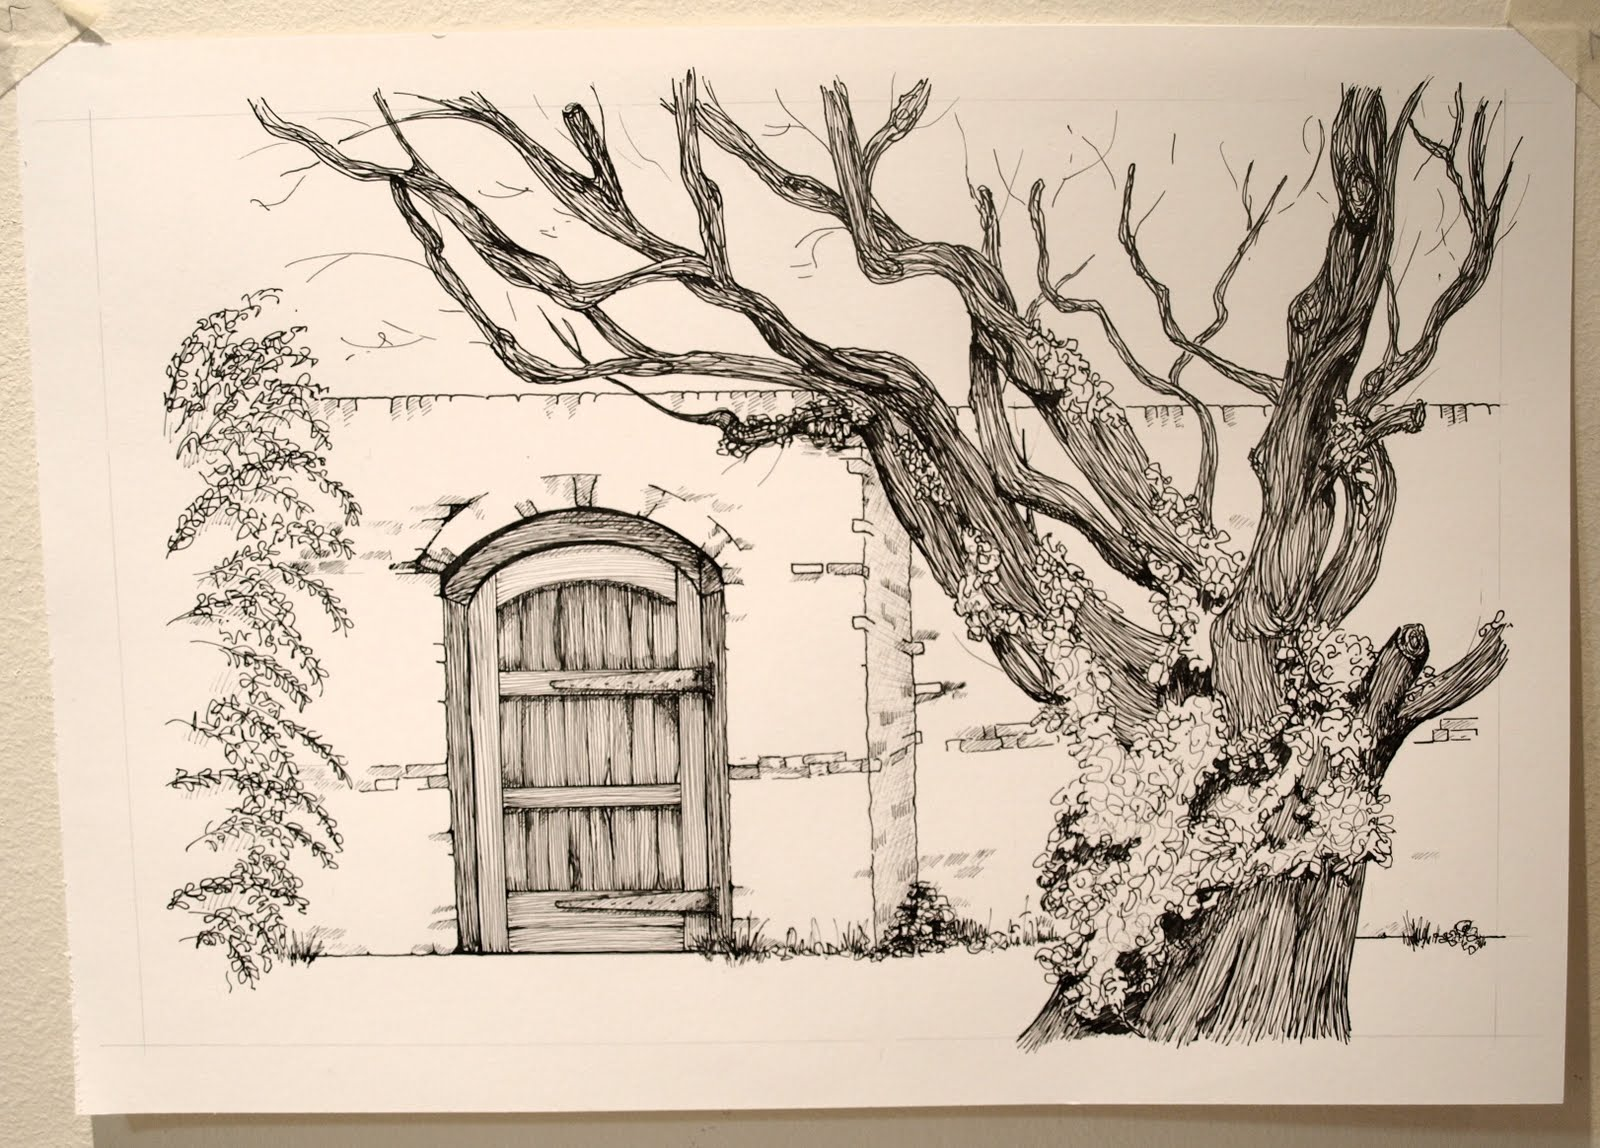 ART OF A NOMAD: Secret Garden